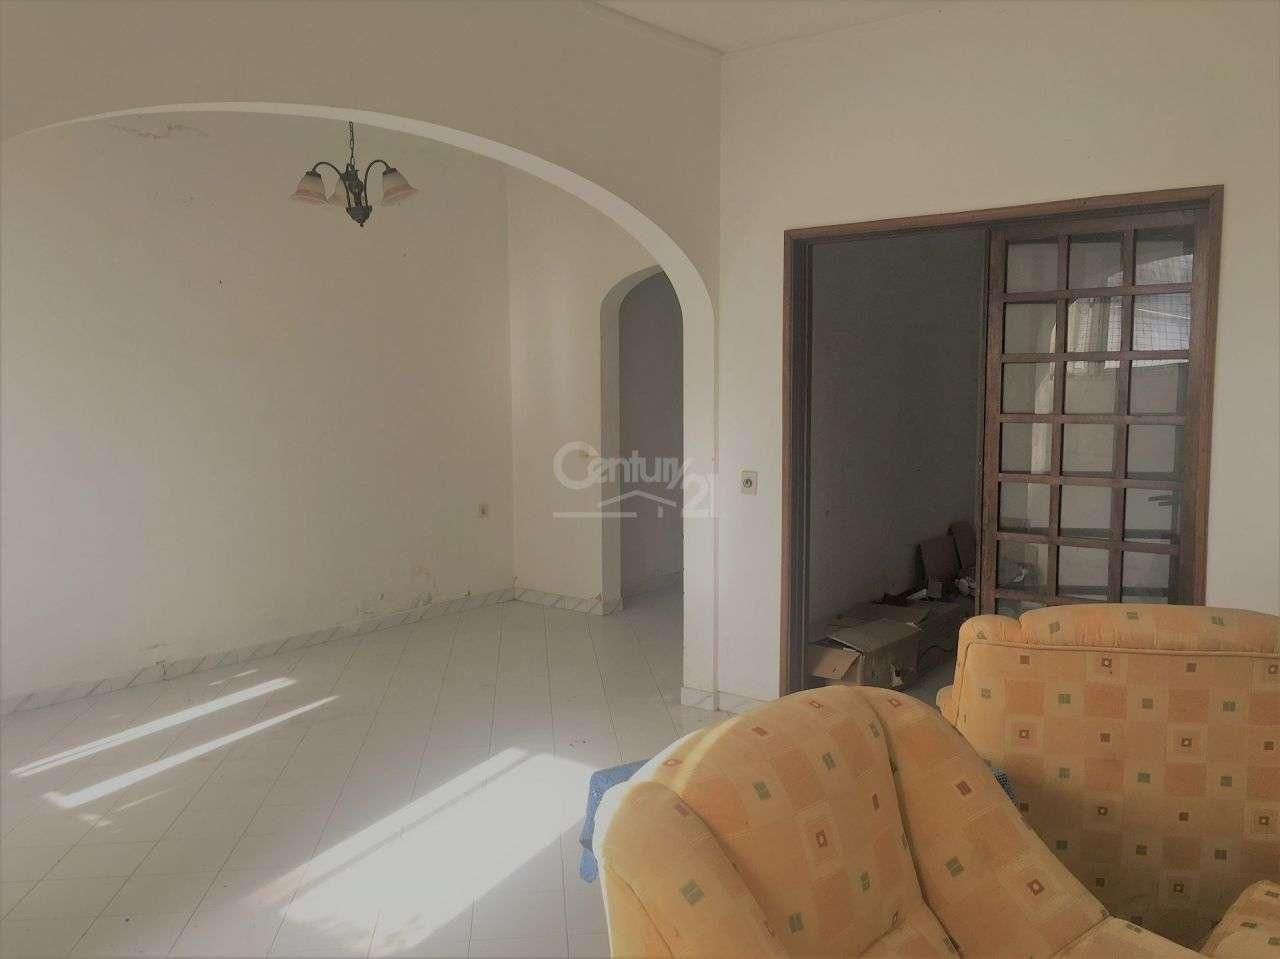 Apartamento para comprar, Alte, Faro - Foto 3